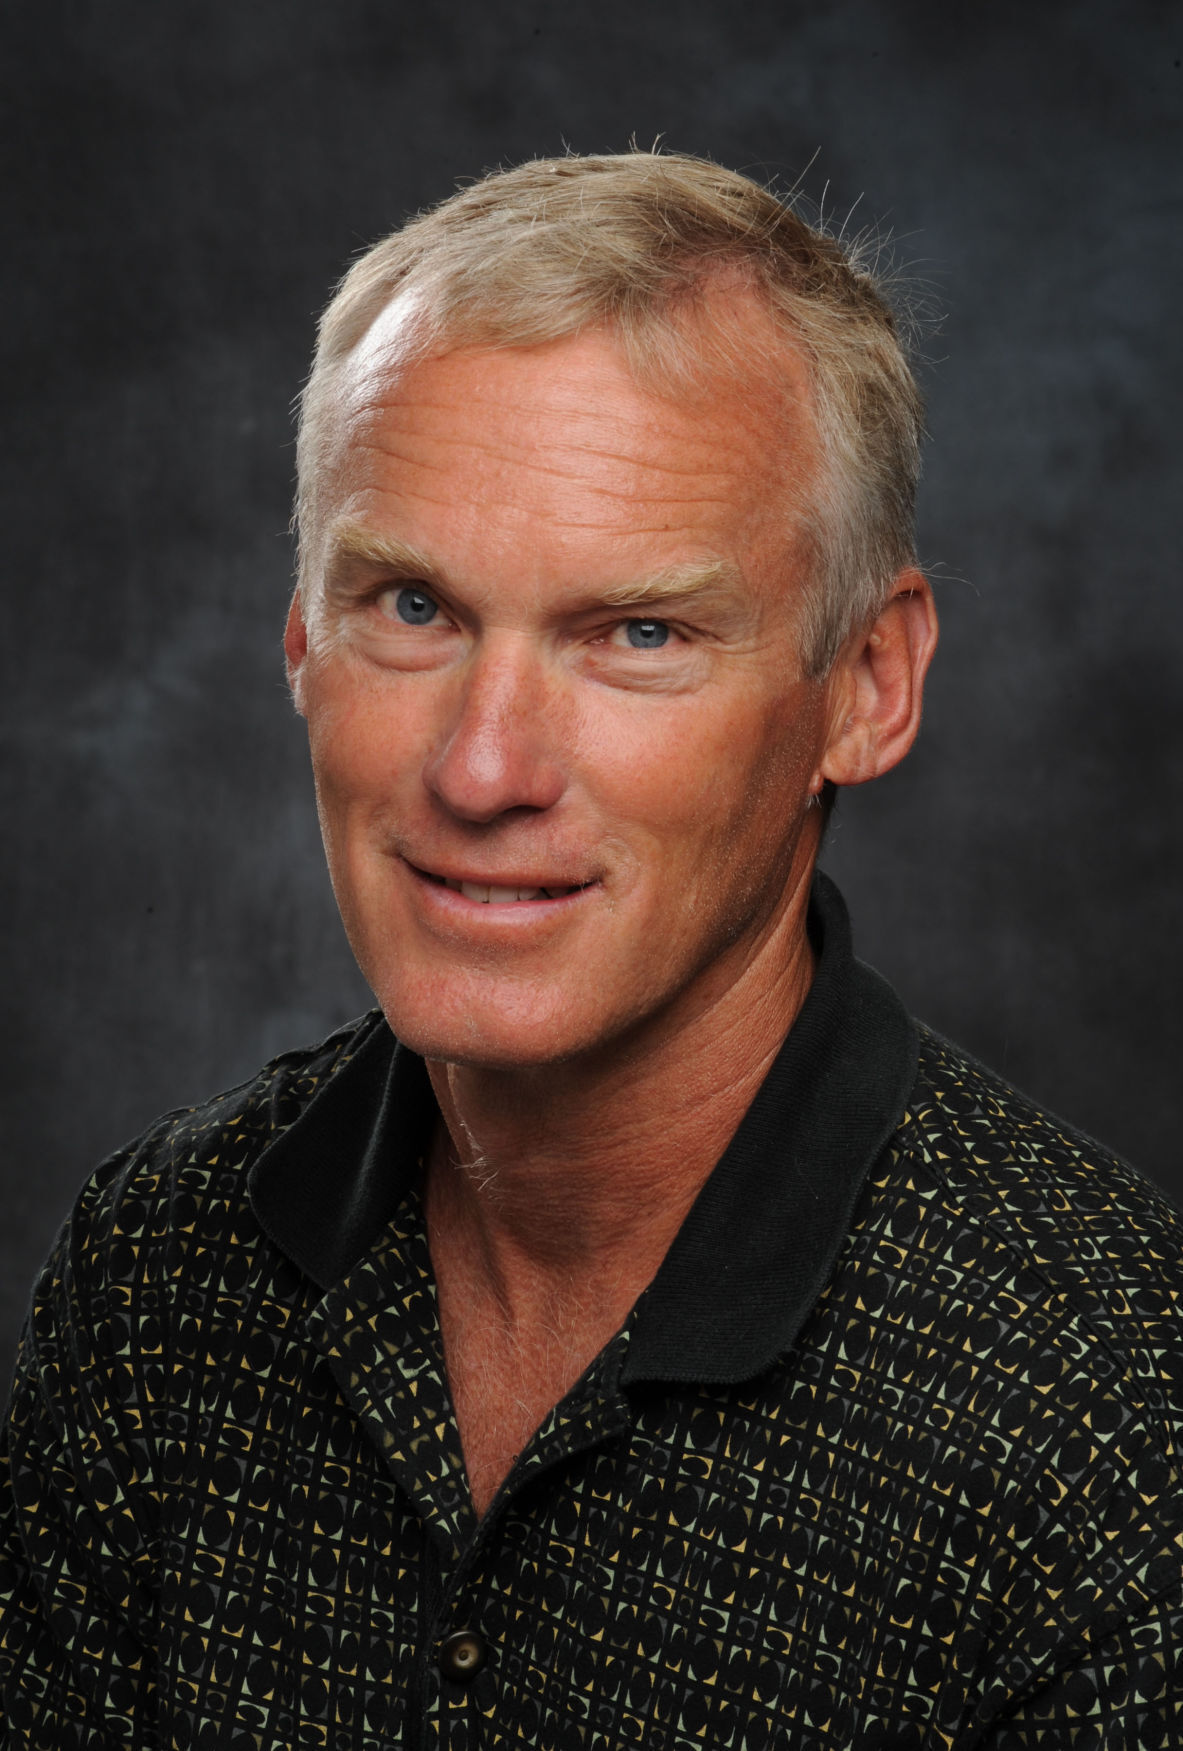 Jeff Welsch